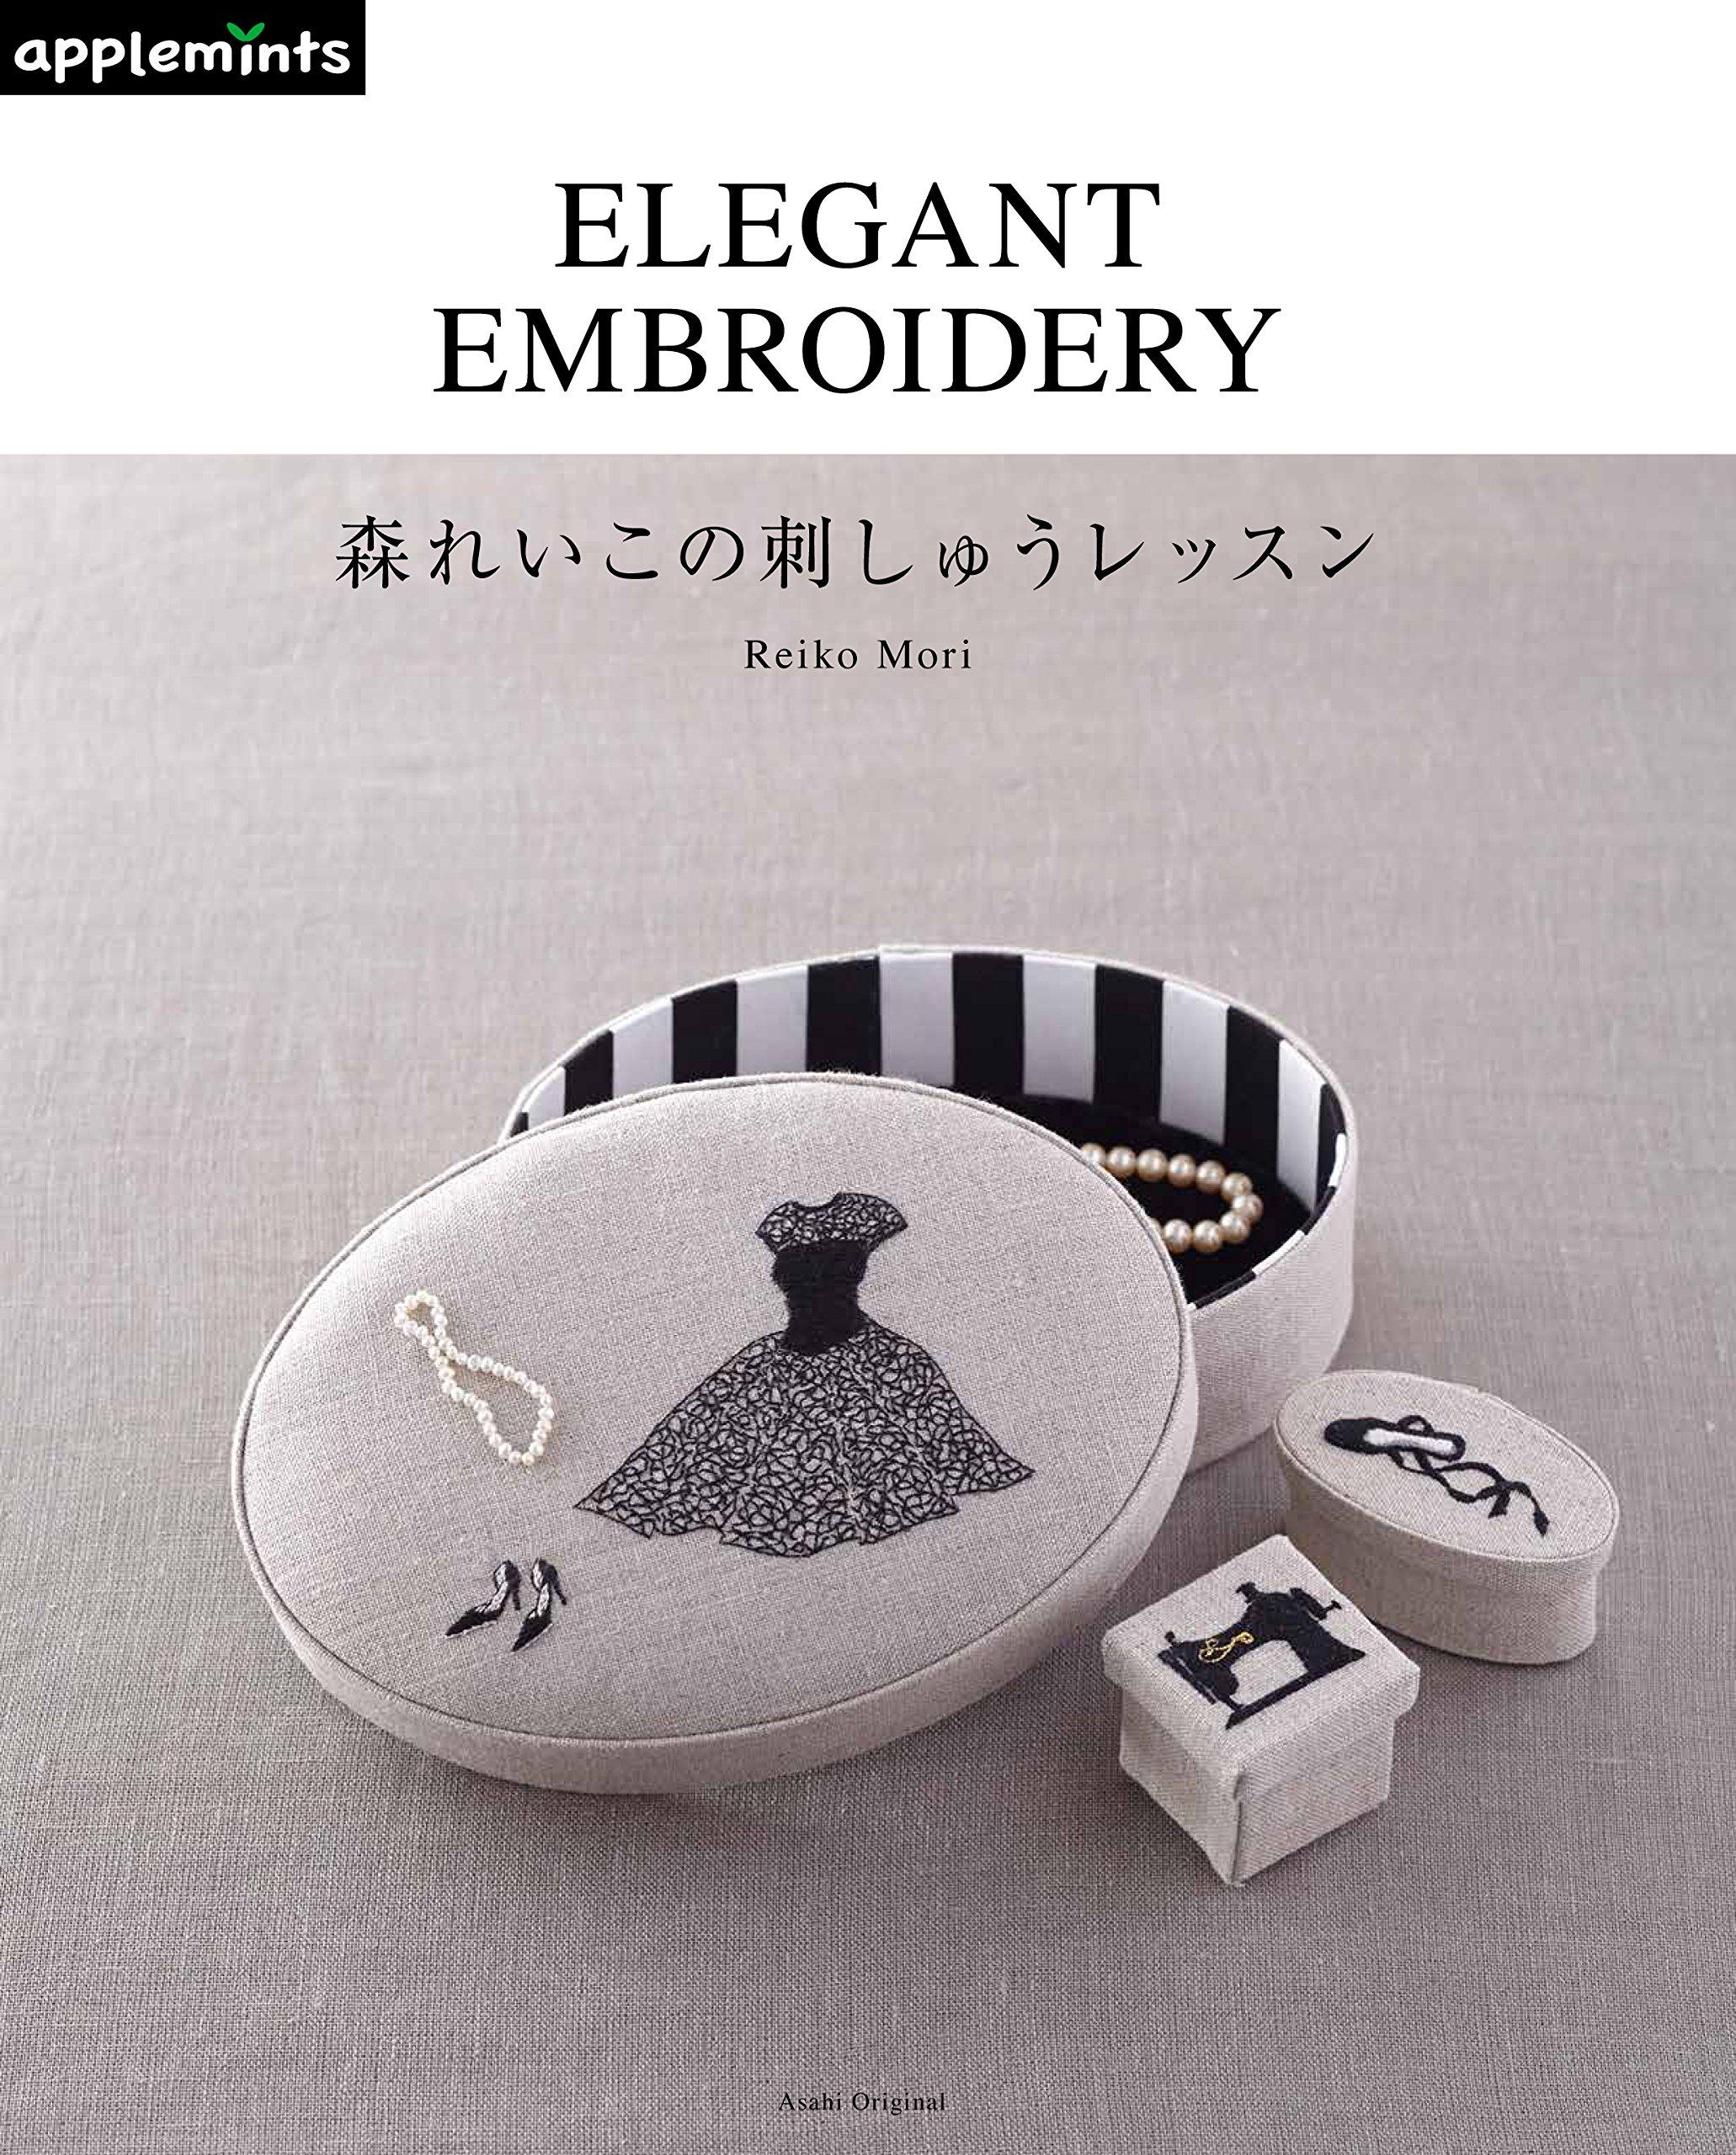 Embroidery lessons of Reiko Mori